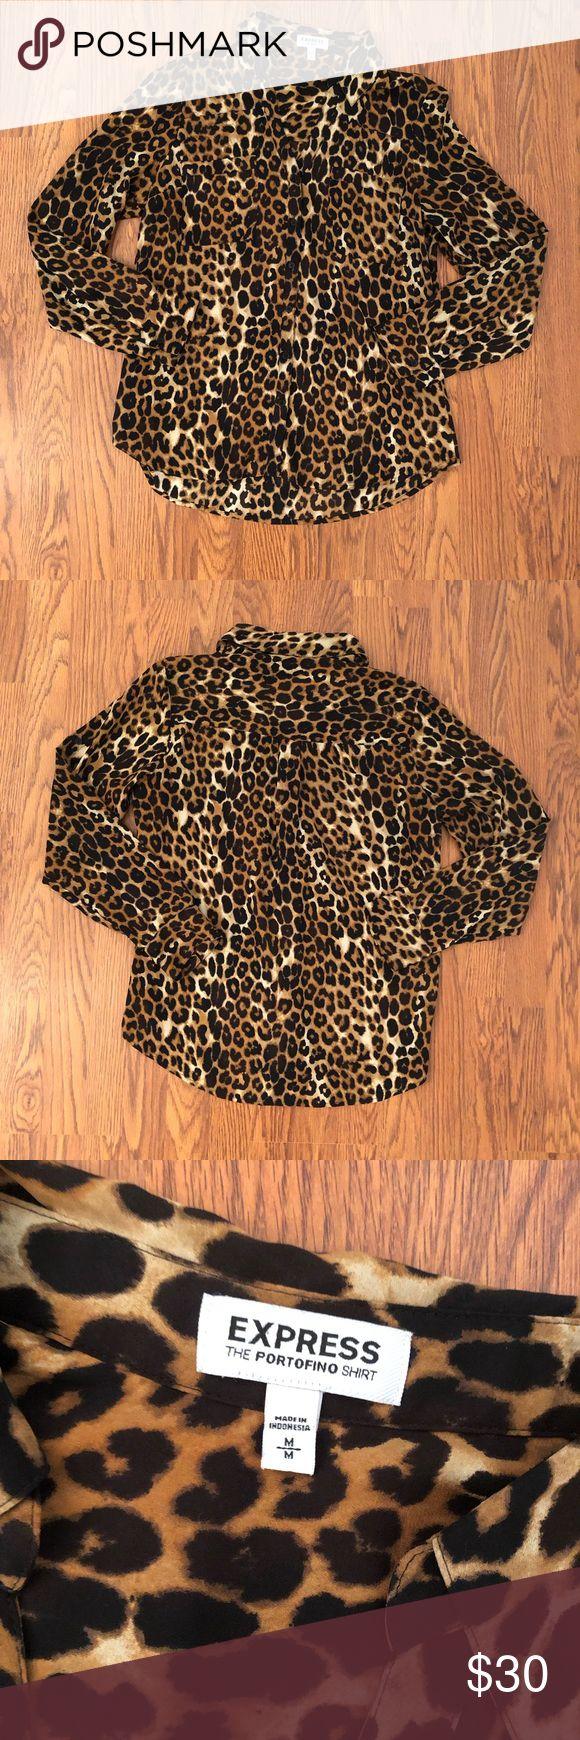 Express | Cheetah Print Portofino Shirt Size M Express | Cheetah Print Portofino…